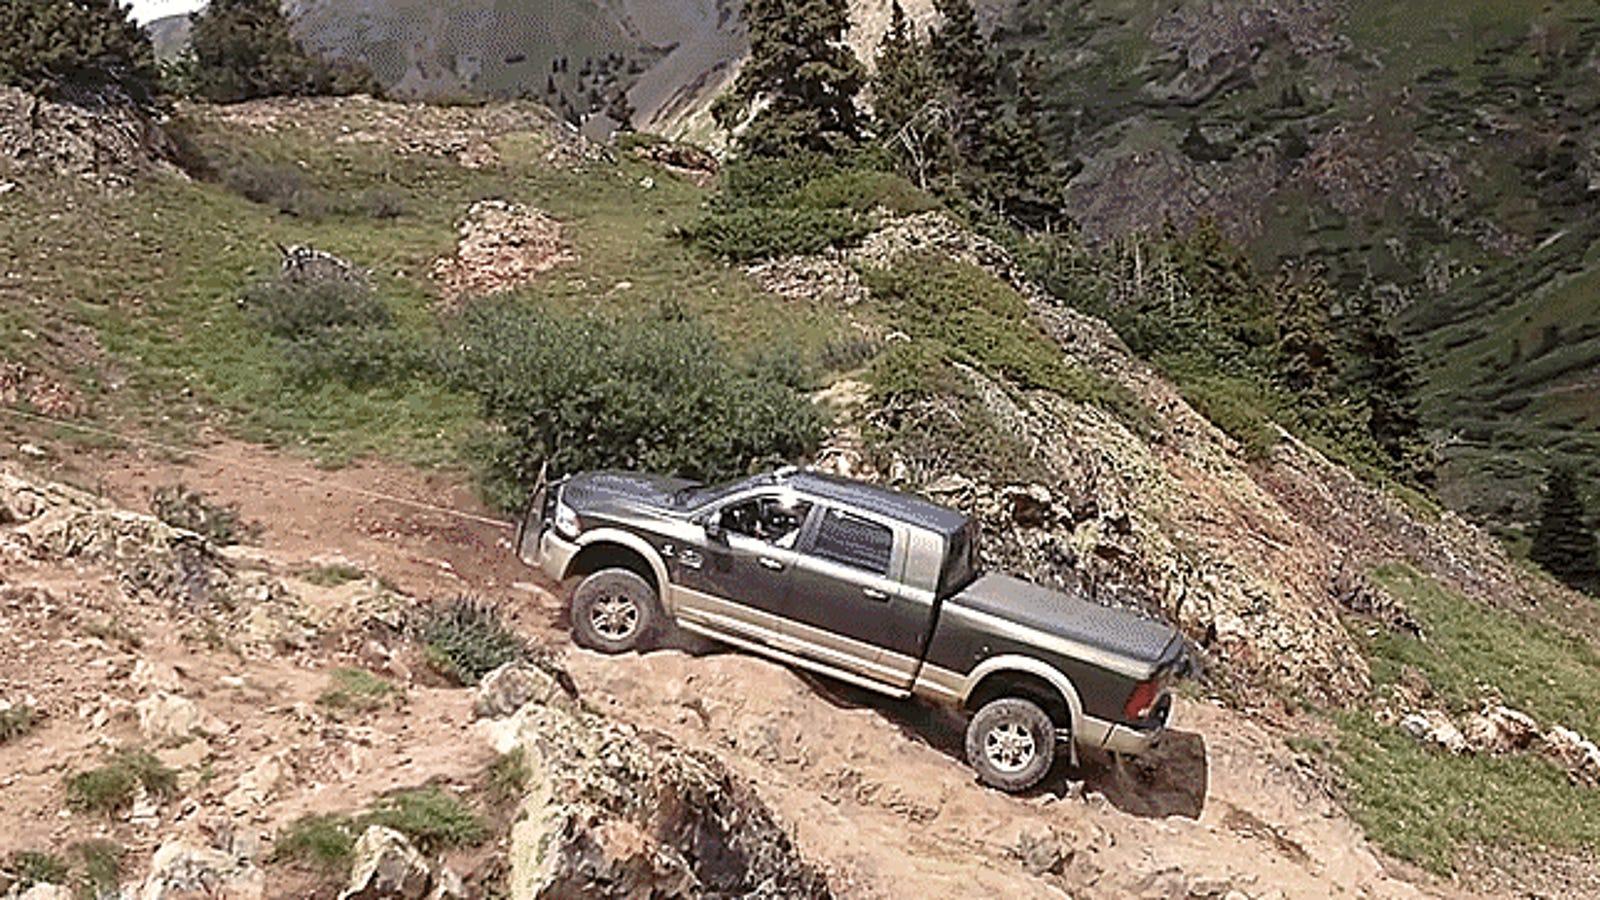 Big-Ass Trucks Aren't Good Off-Road